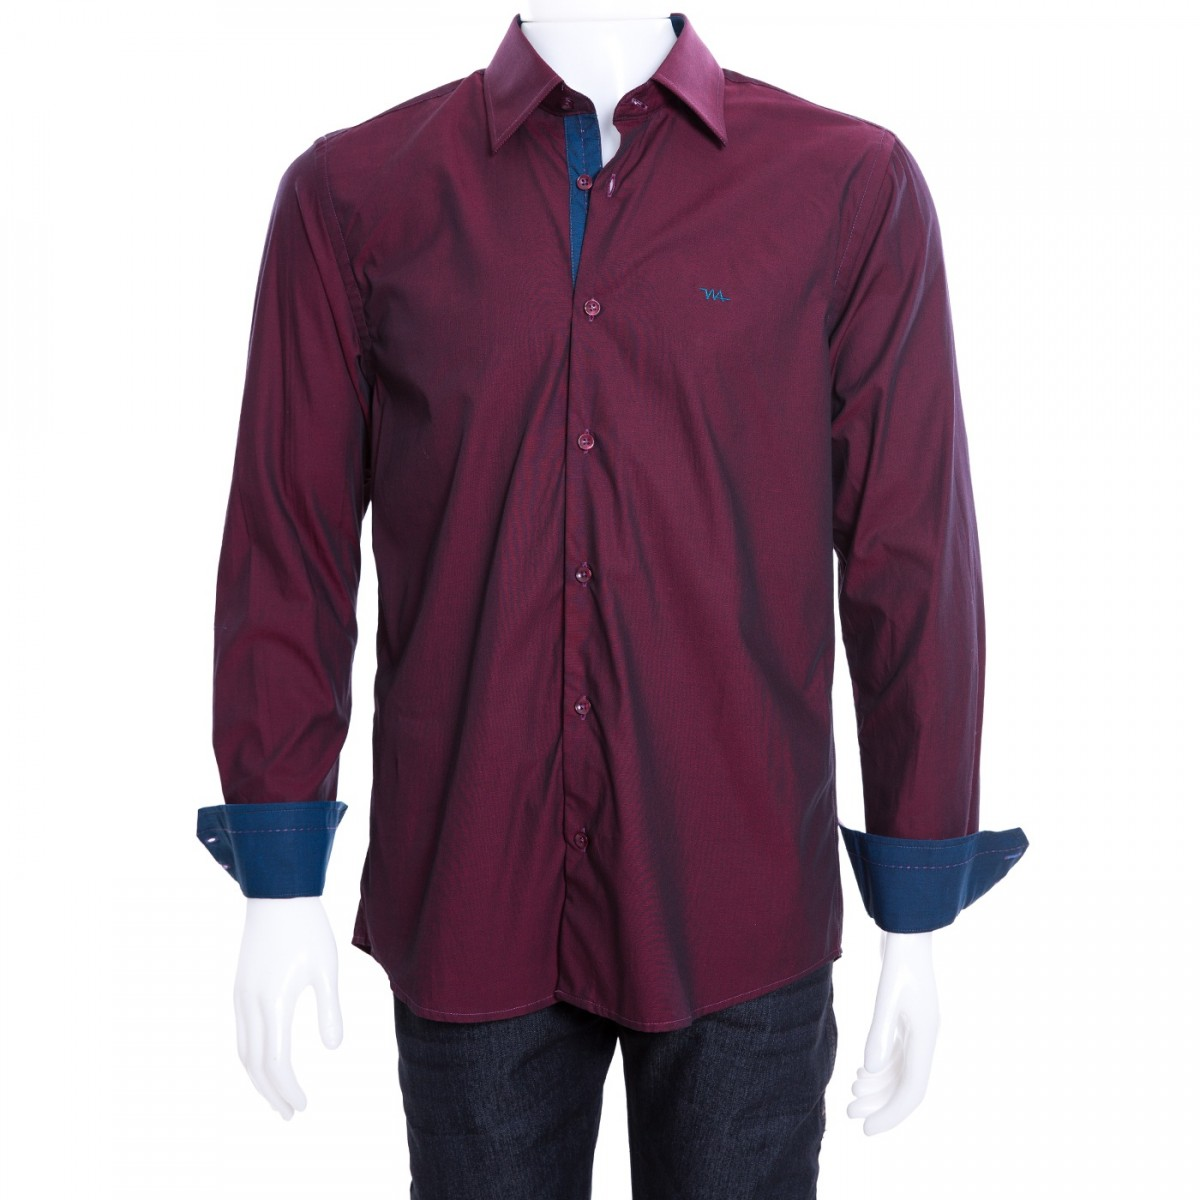 faadc99fb Bizz Store - Camisa Social Masculina W.Albann Slim Fio 50 Bordô